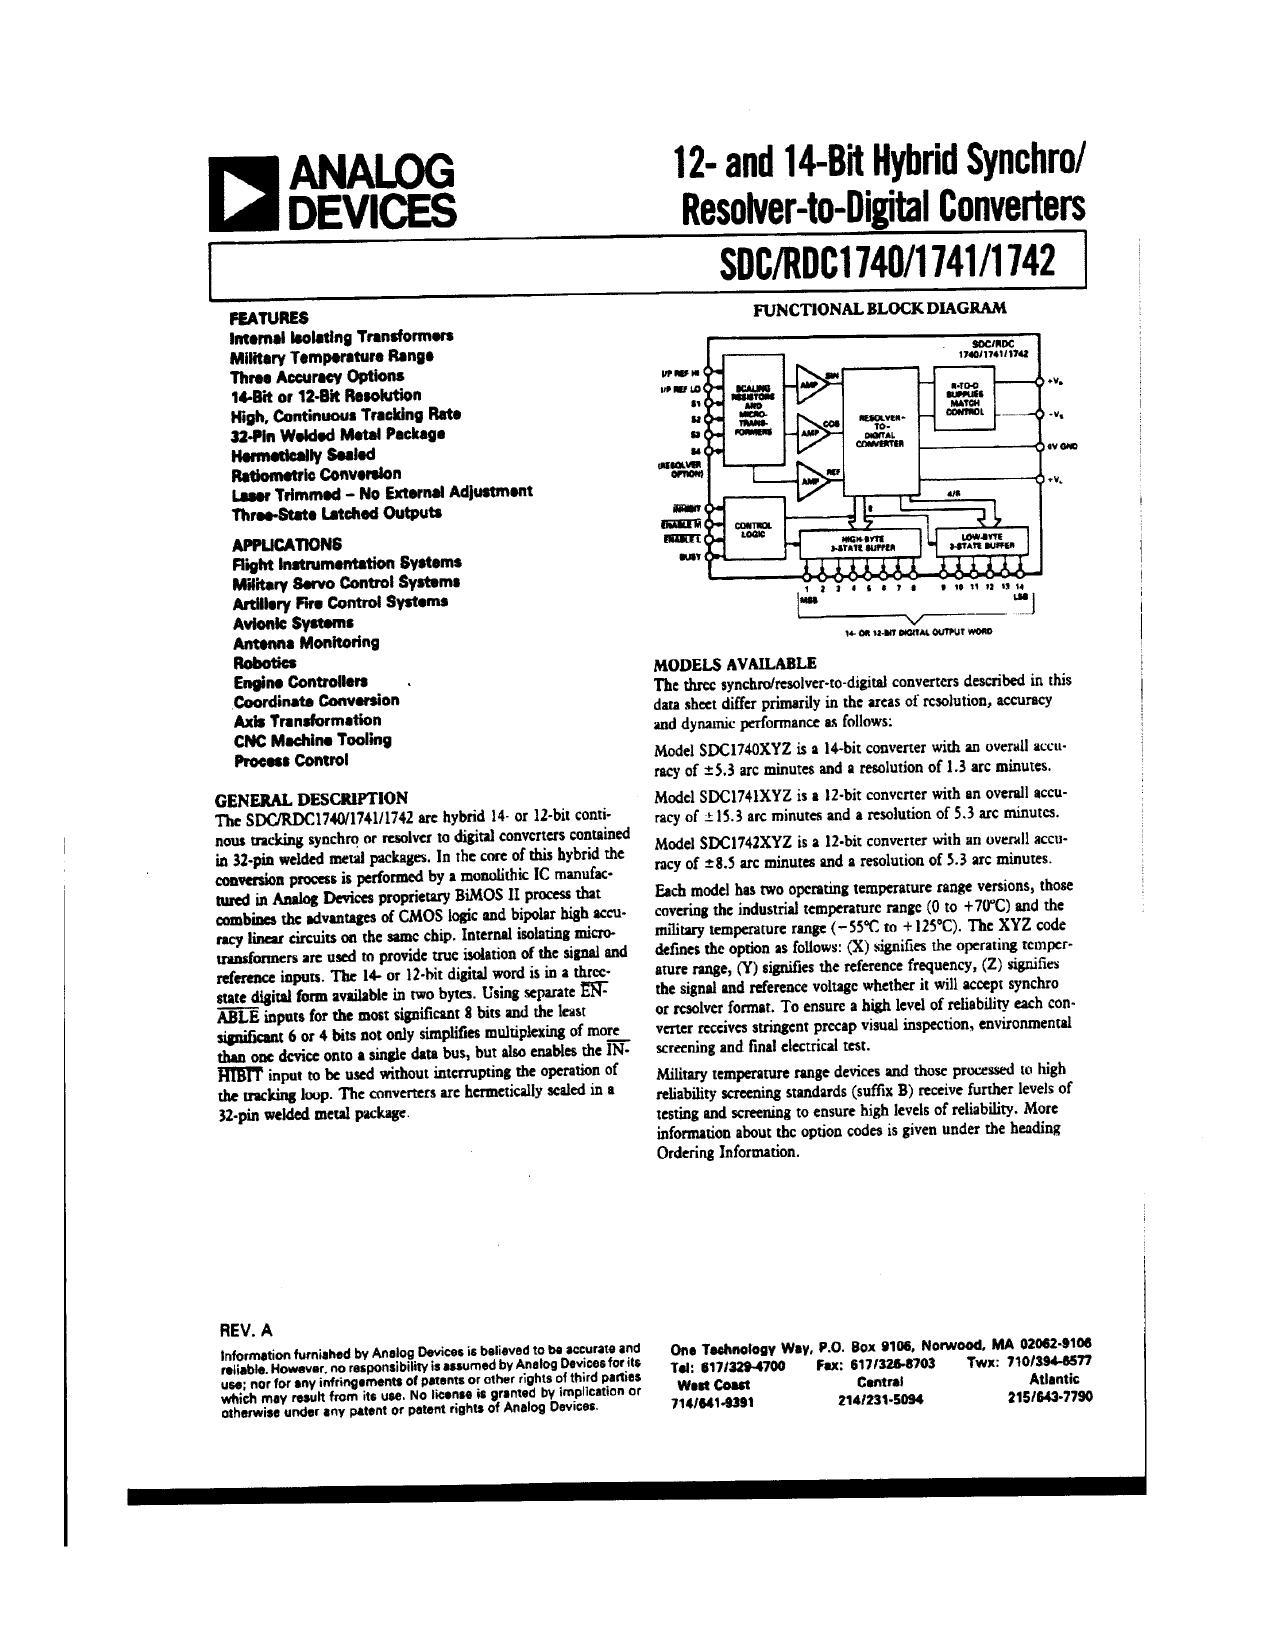 SDC1741 datasheet